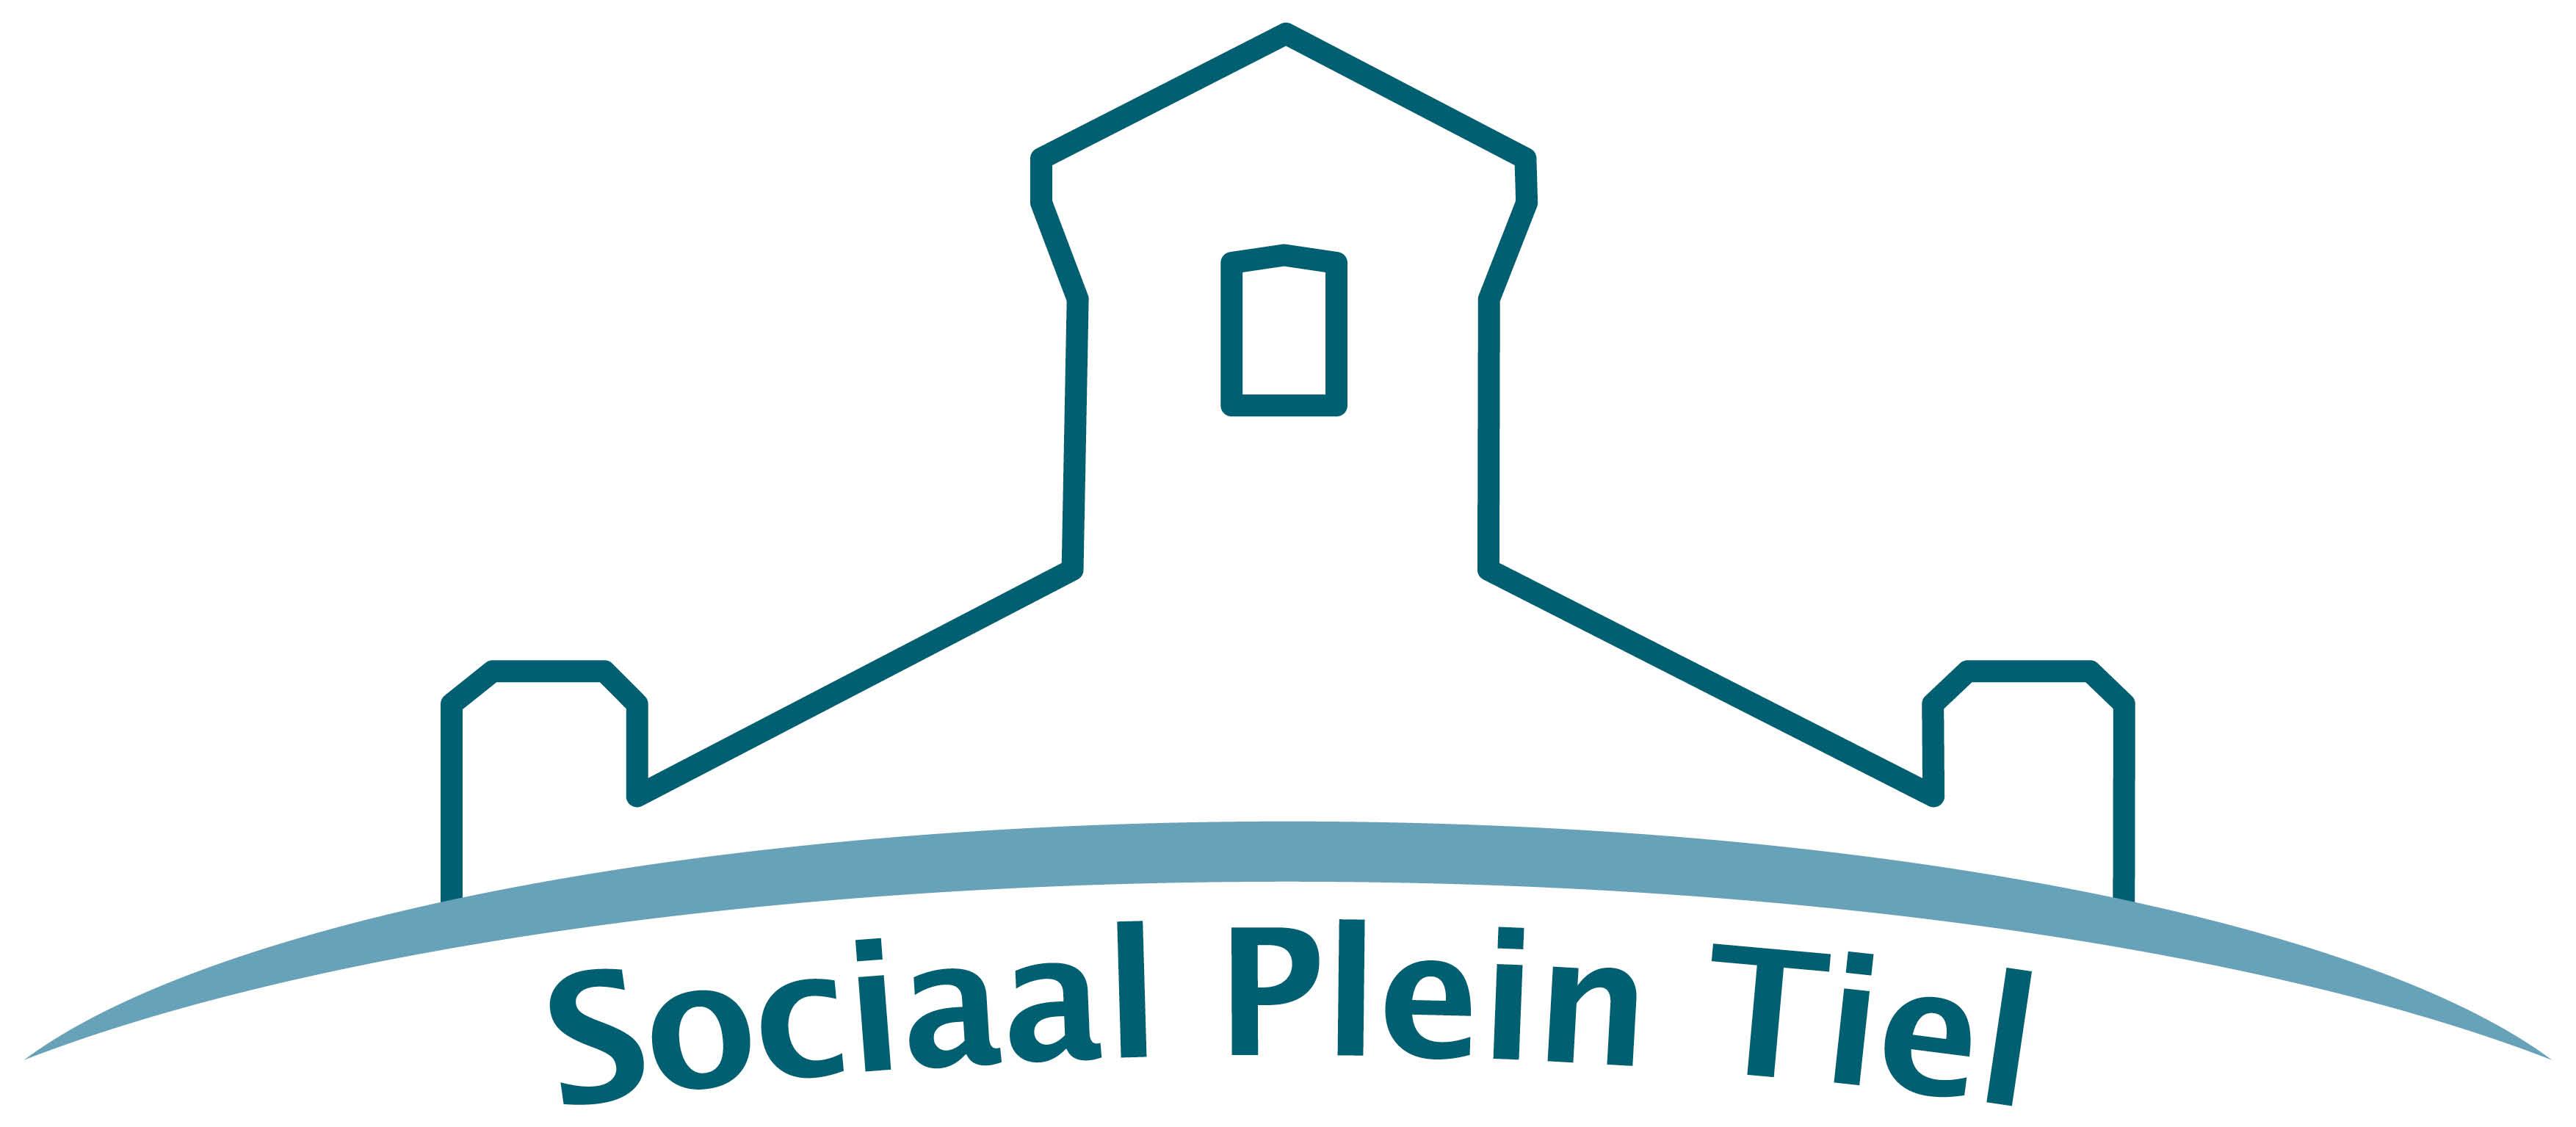 Stichting Sociaal Plein Tiel